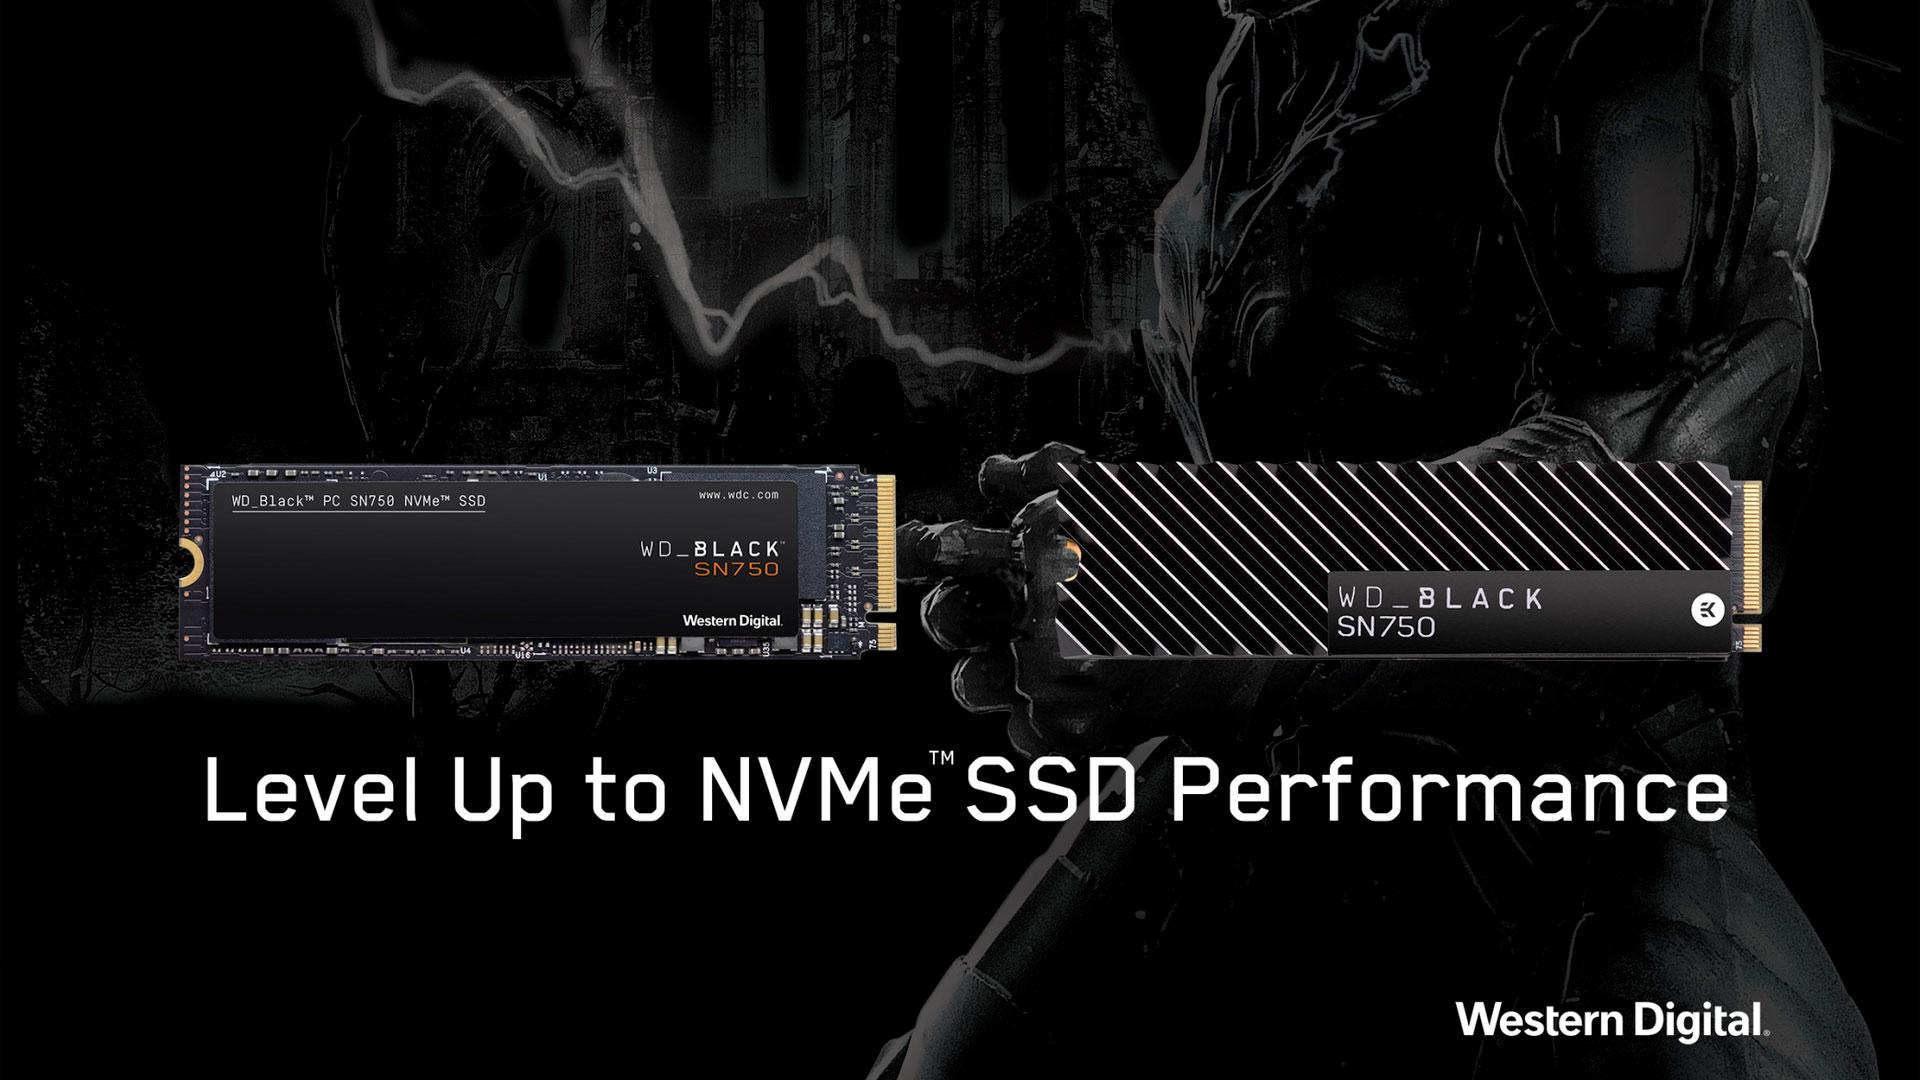 WD Black SN750 NVMe PCIe SSD